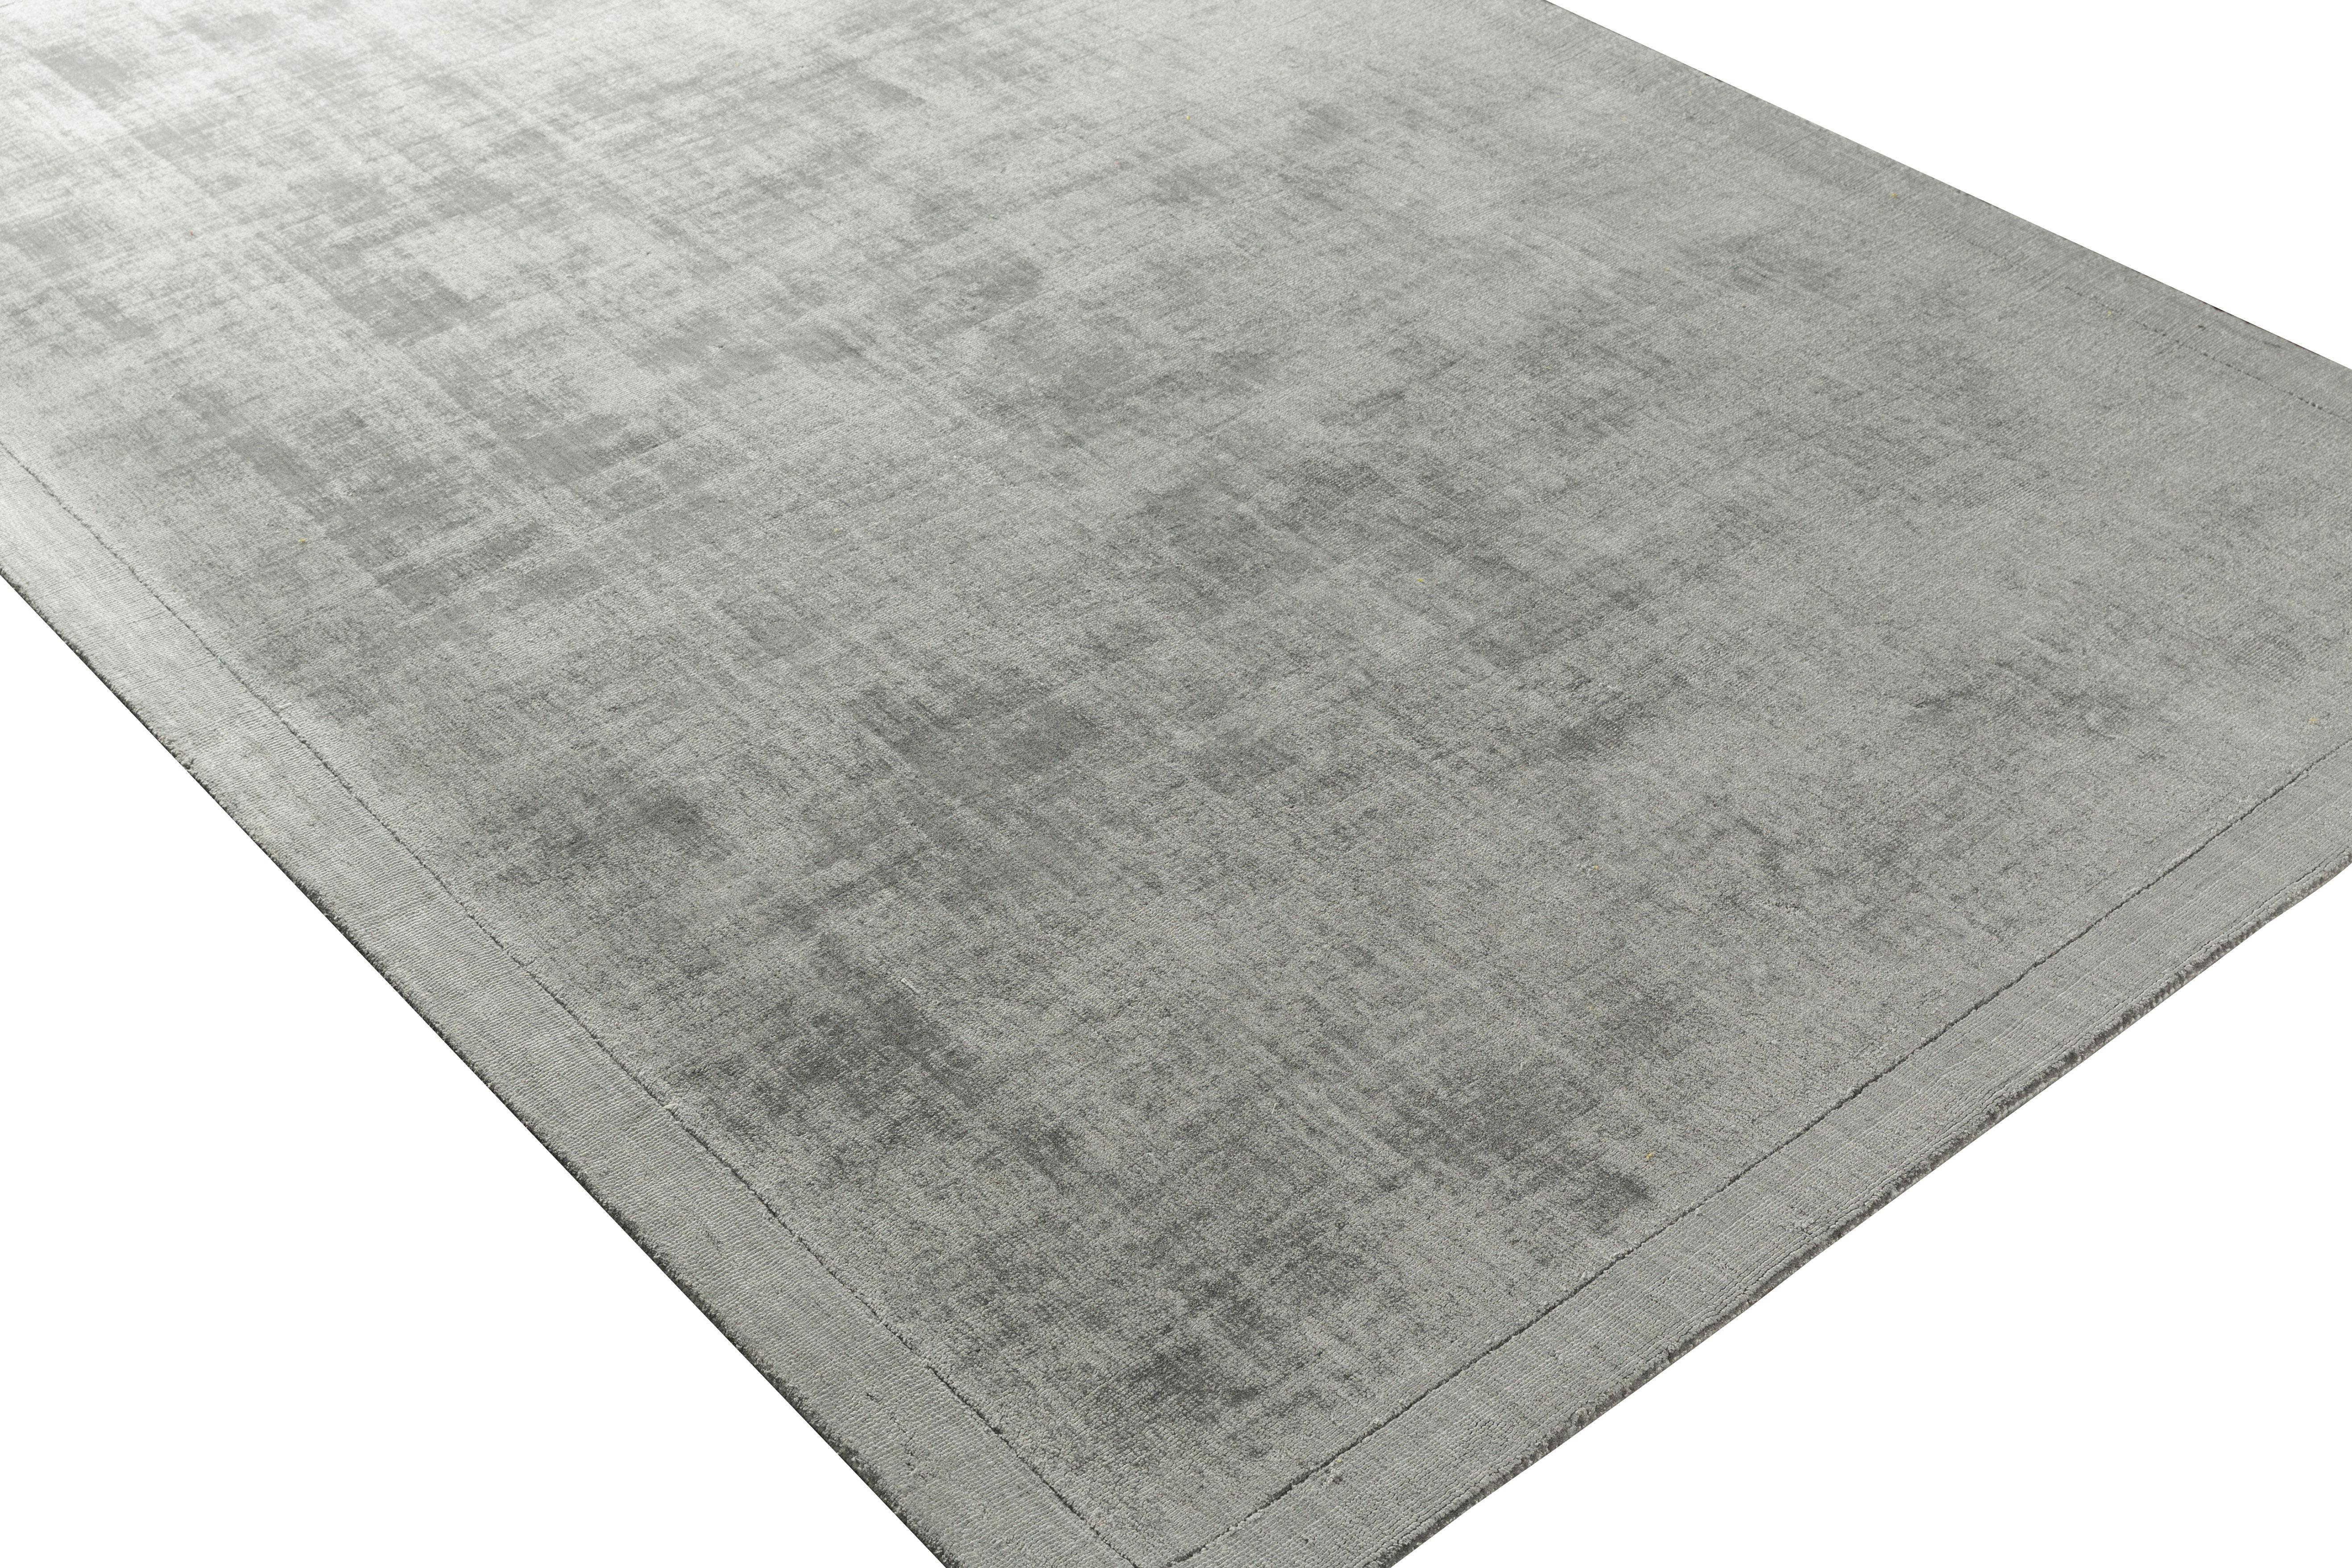 Carpet Cleaning Langley Ok Carpet Vidalondon